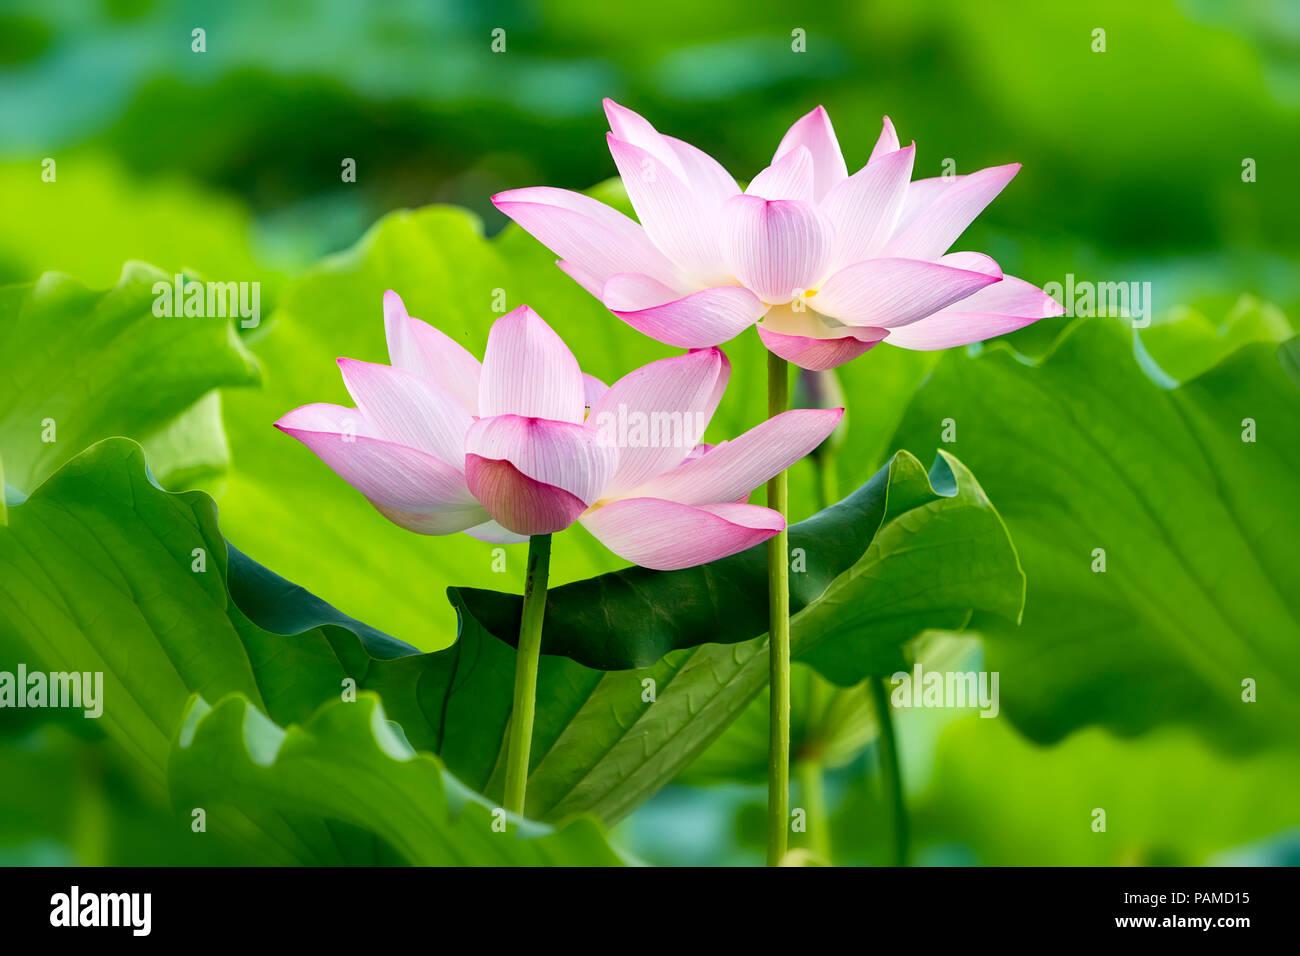 Blooming lotus flower stock photo 213120241 alamy blooming lotus flower izmirmasajfo